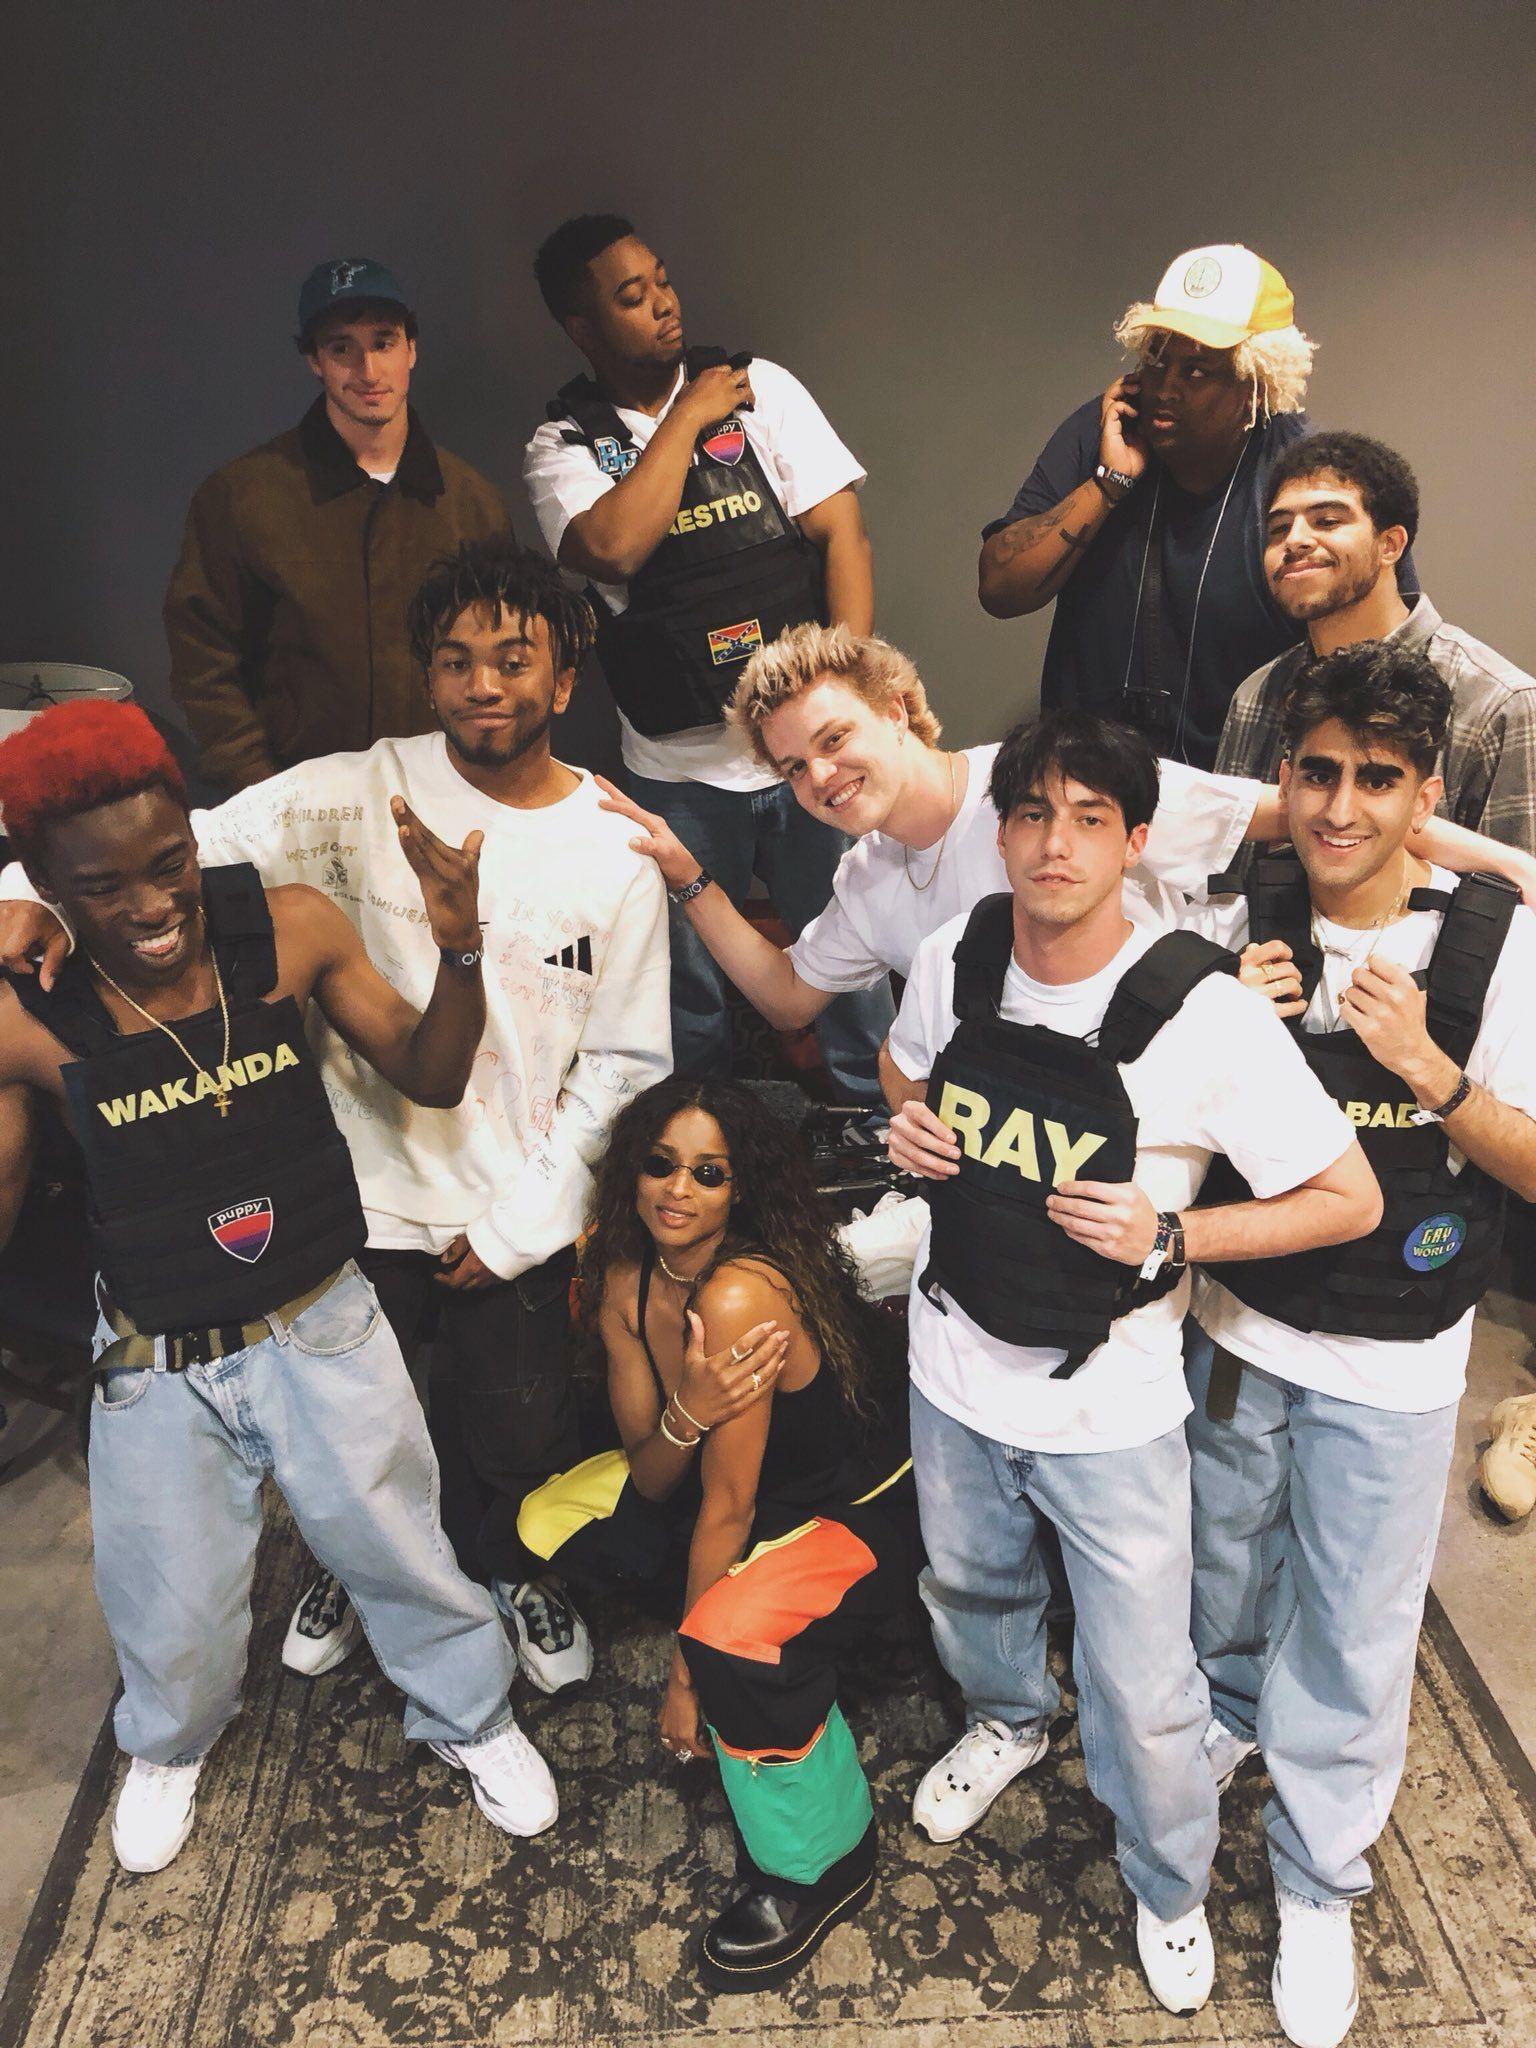 All-American Boyband BROCKHAMPTON presents Saturation II  in 2019